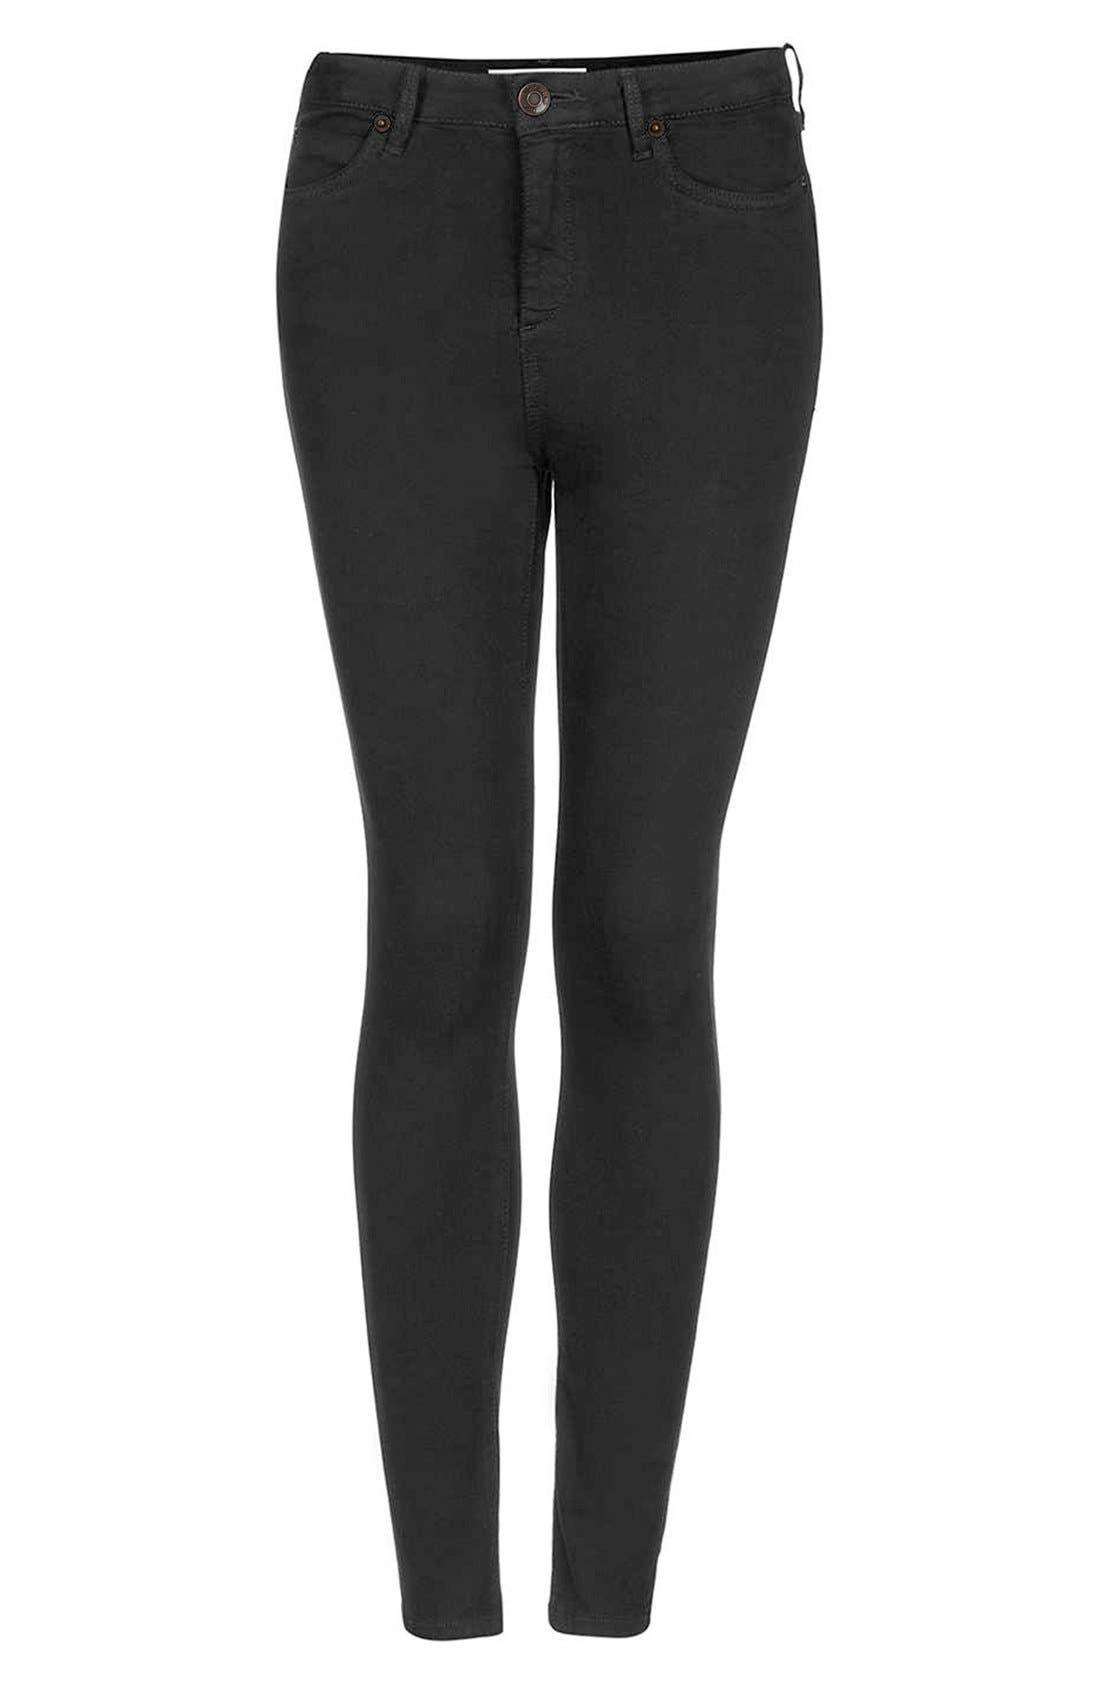 Main Image - Topshop Moto 'Jamie' High Rise Skinny Jeans (Petite)